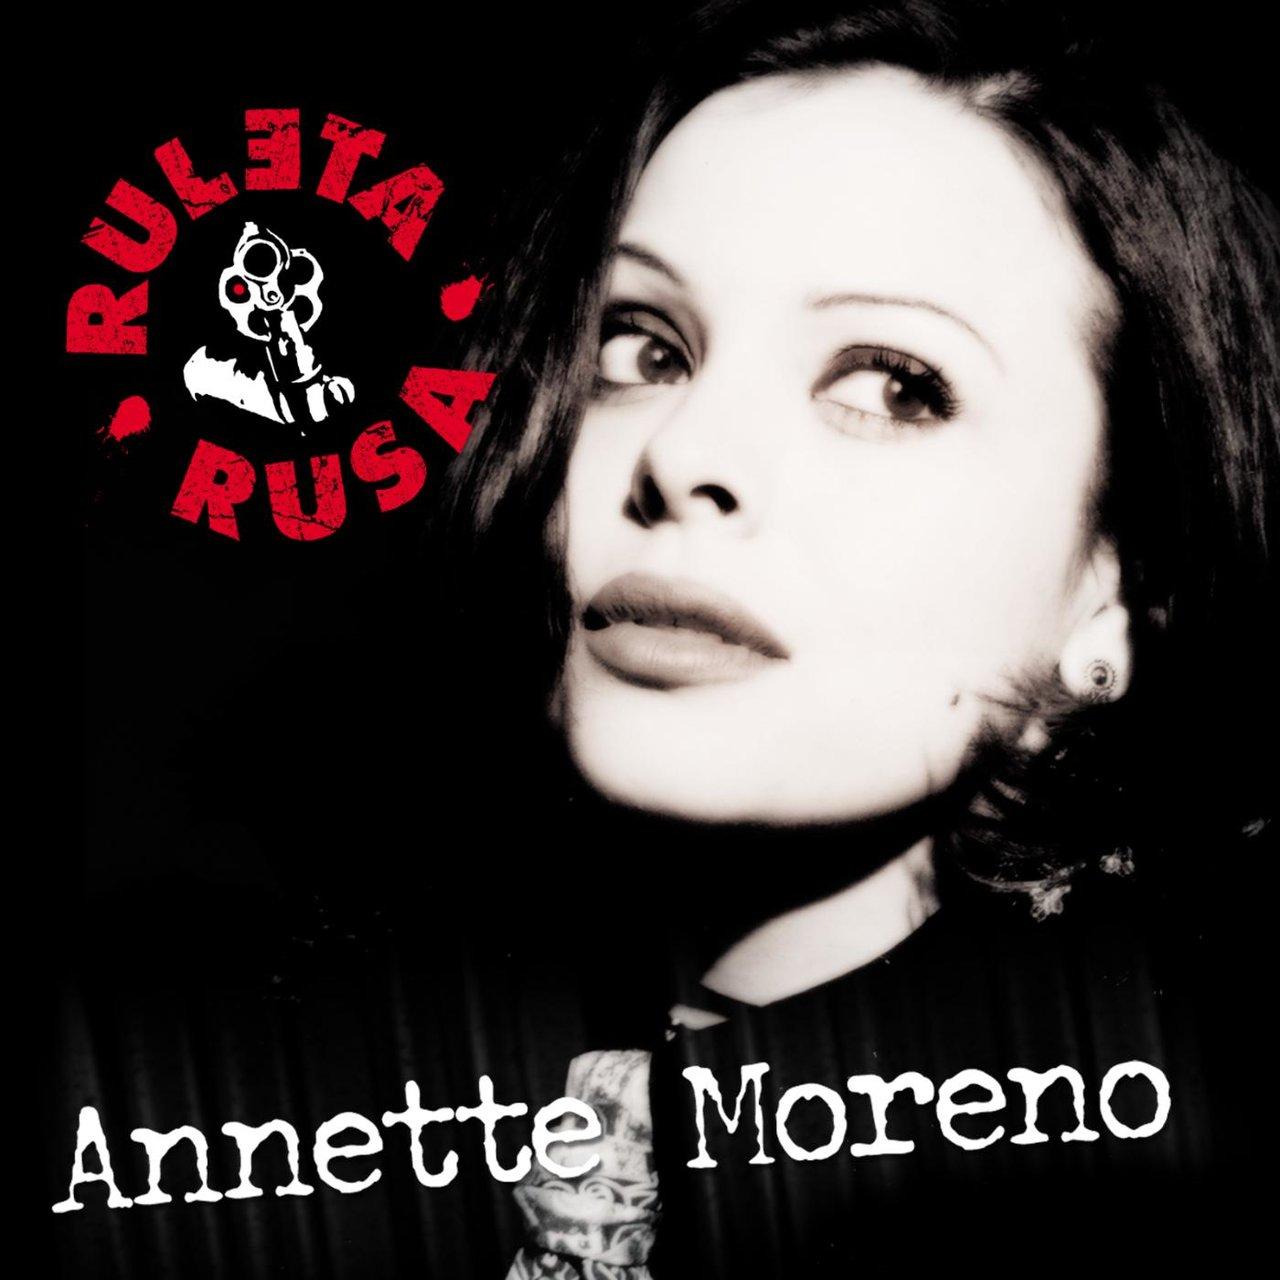 Descargar musica wav flac itunes mp3 descargar annette for Annette moreno jardin de rosas